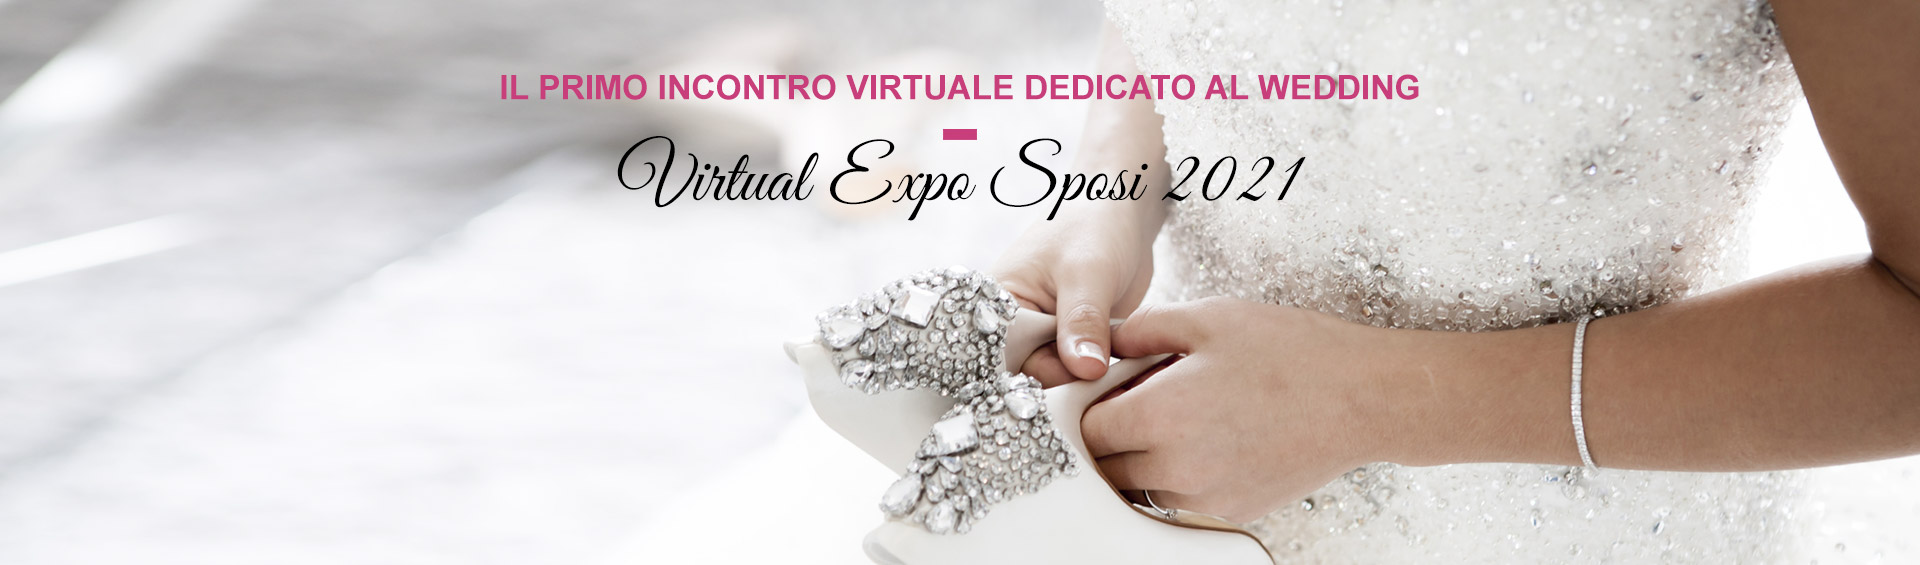 Virtual Expo Sposi 2021